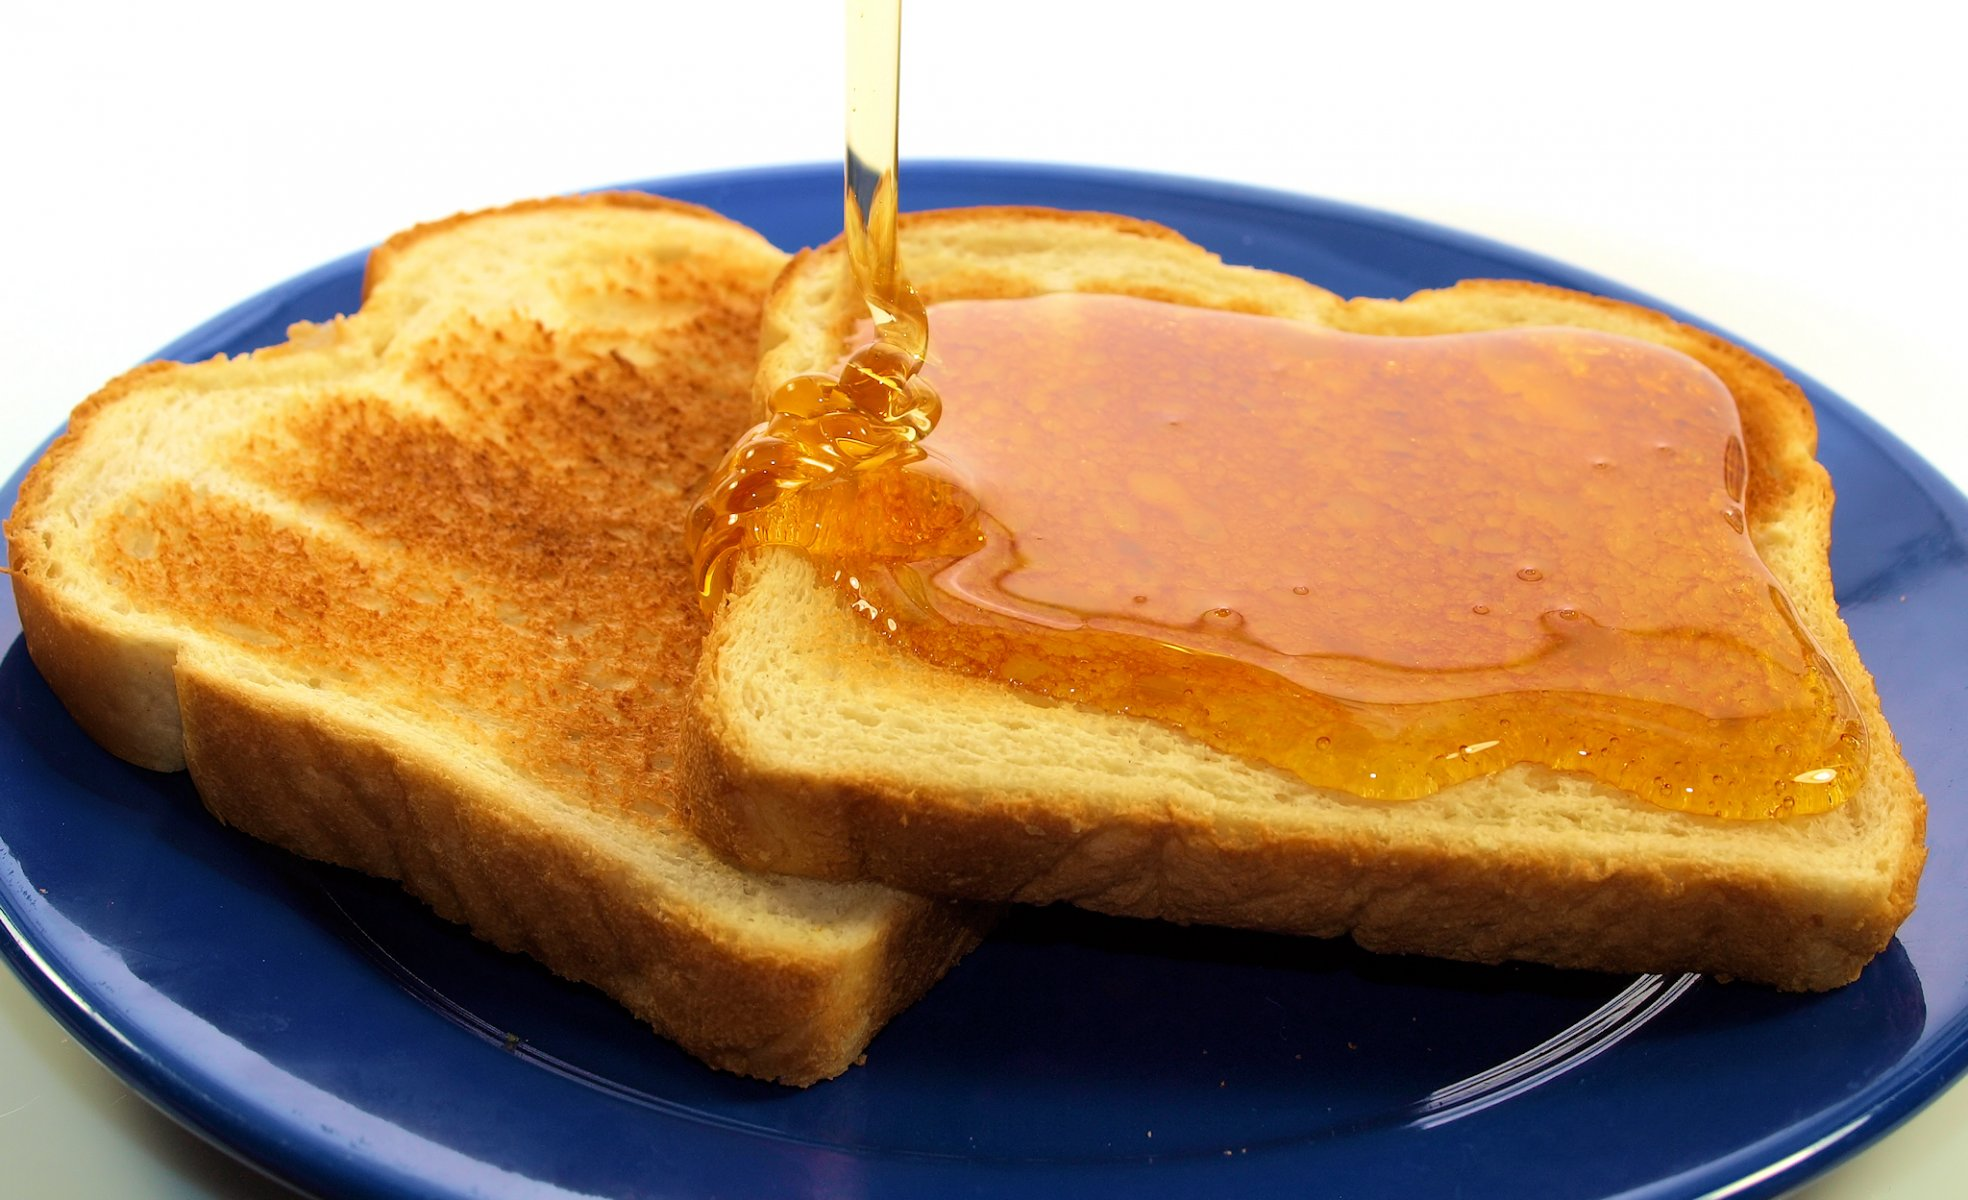 тарелка тосты завтрак plate toast Breakfast без смс